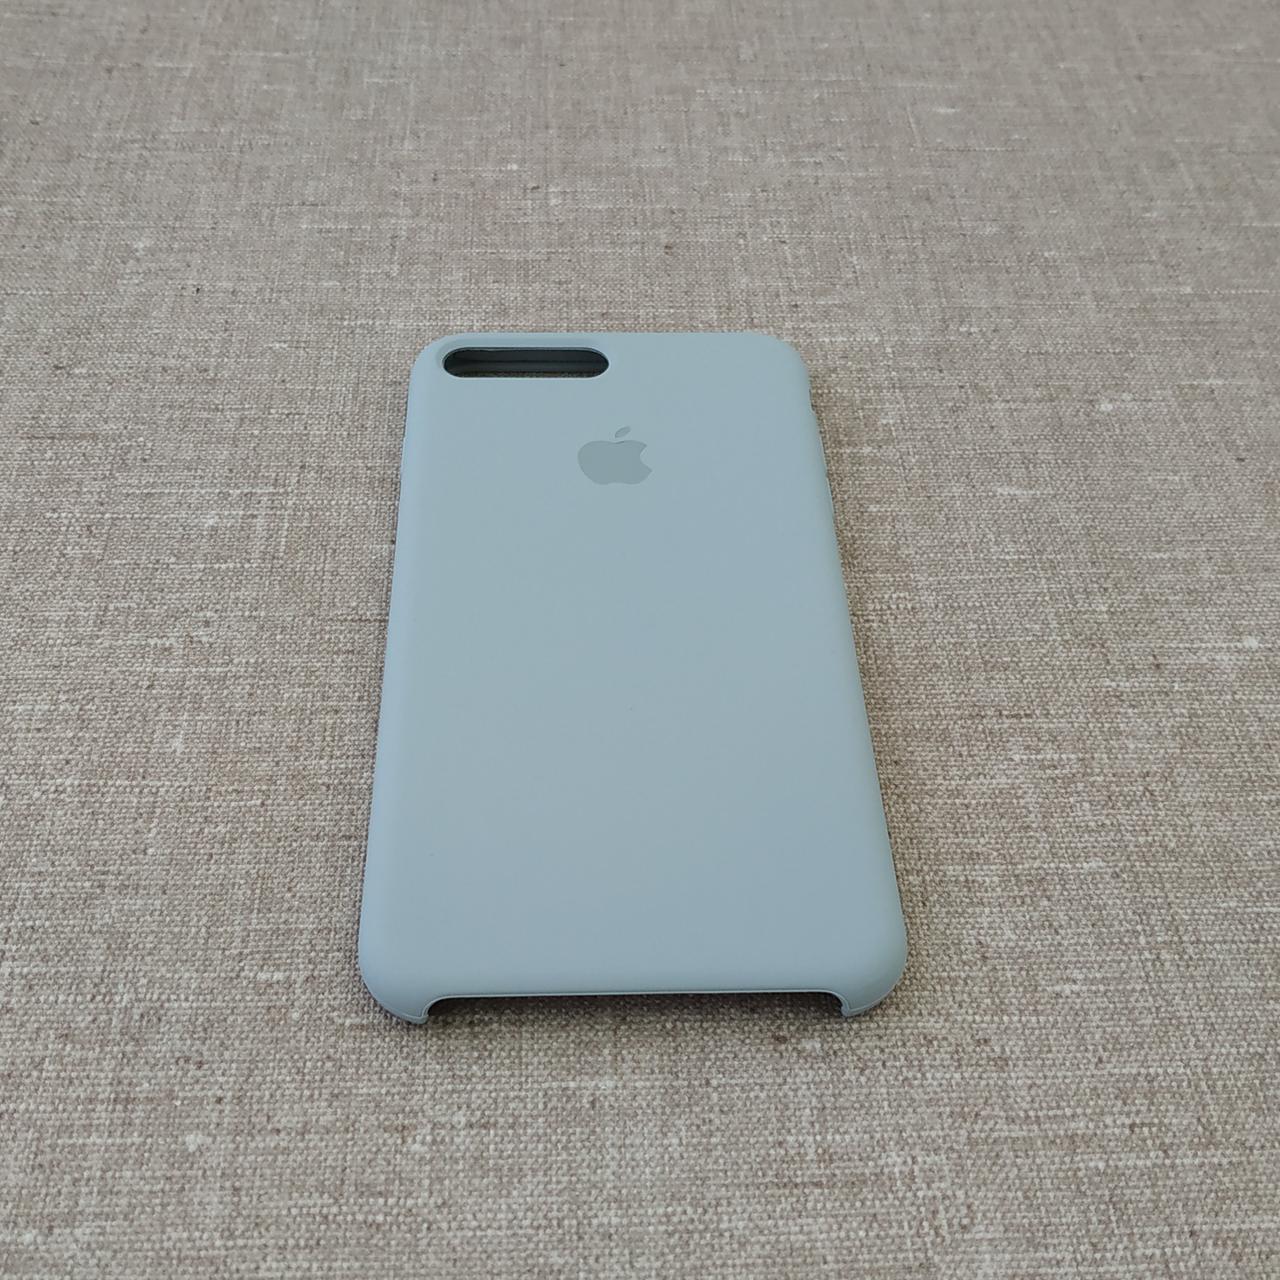 Apple iPhone 7 Plus mist Для телефона Чехол